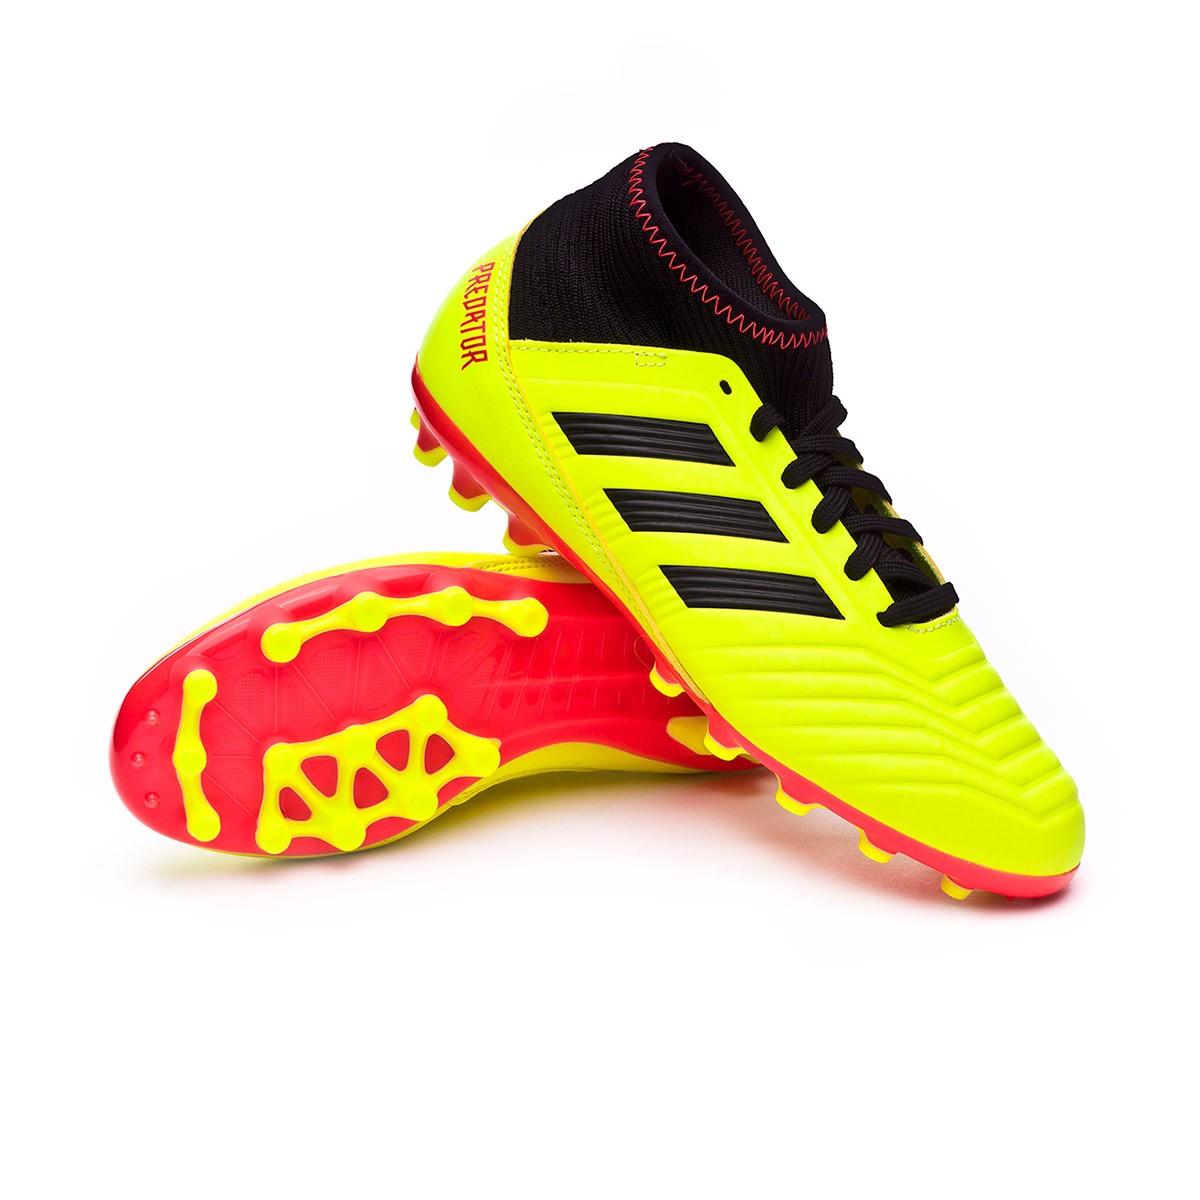 ee6666af43a Football Boots adidas Kids Predator 18.3 AG Solar yellow-Black-Solar ...